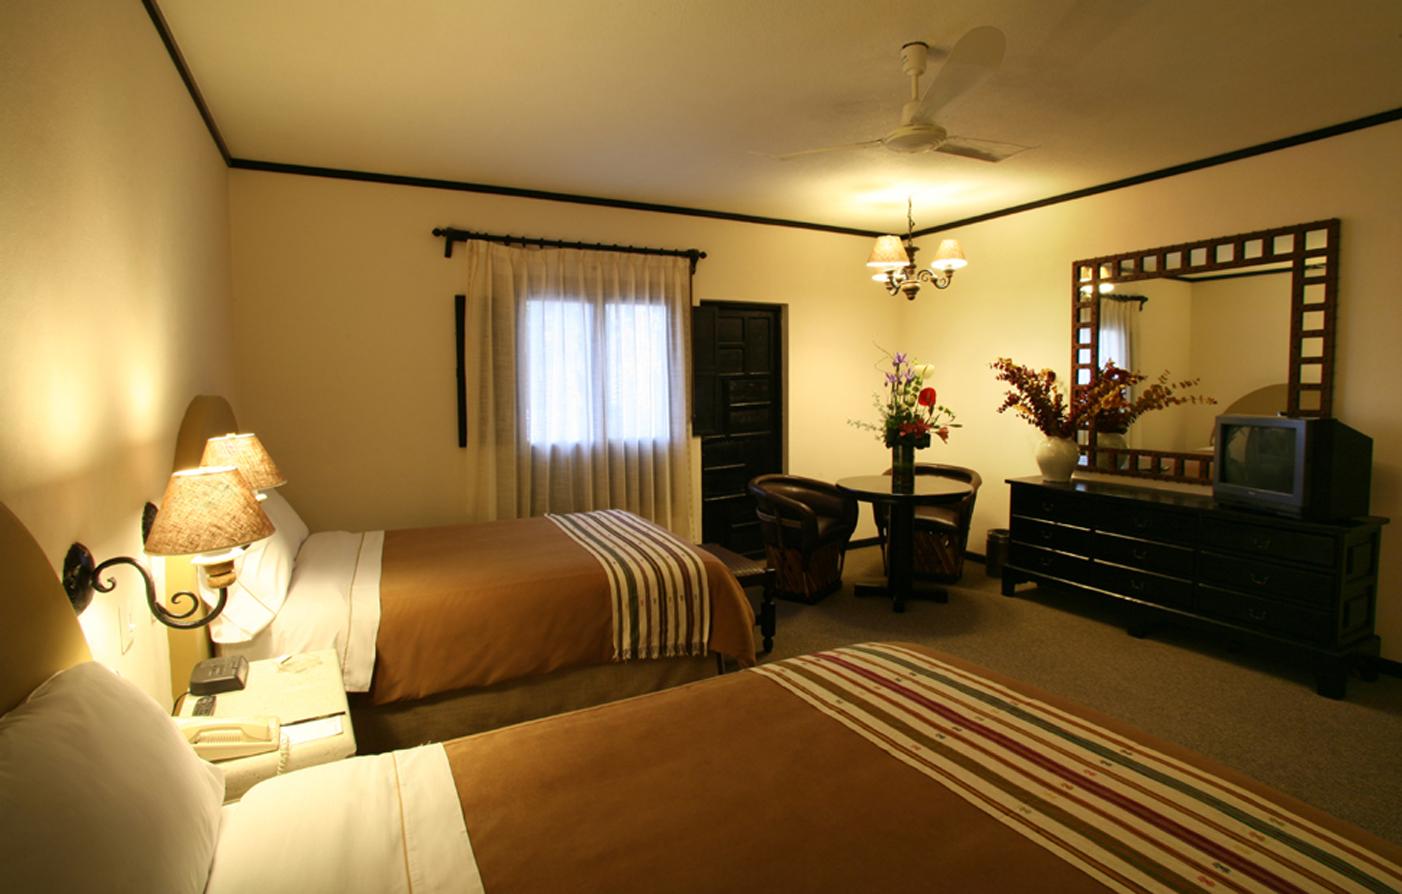 Accommodations hacienda jurica in queretaro for Hotel luxury queretaro